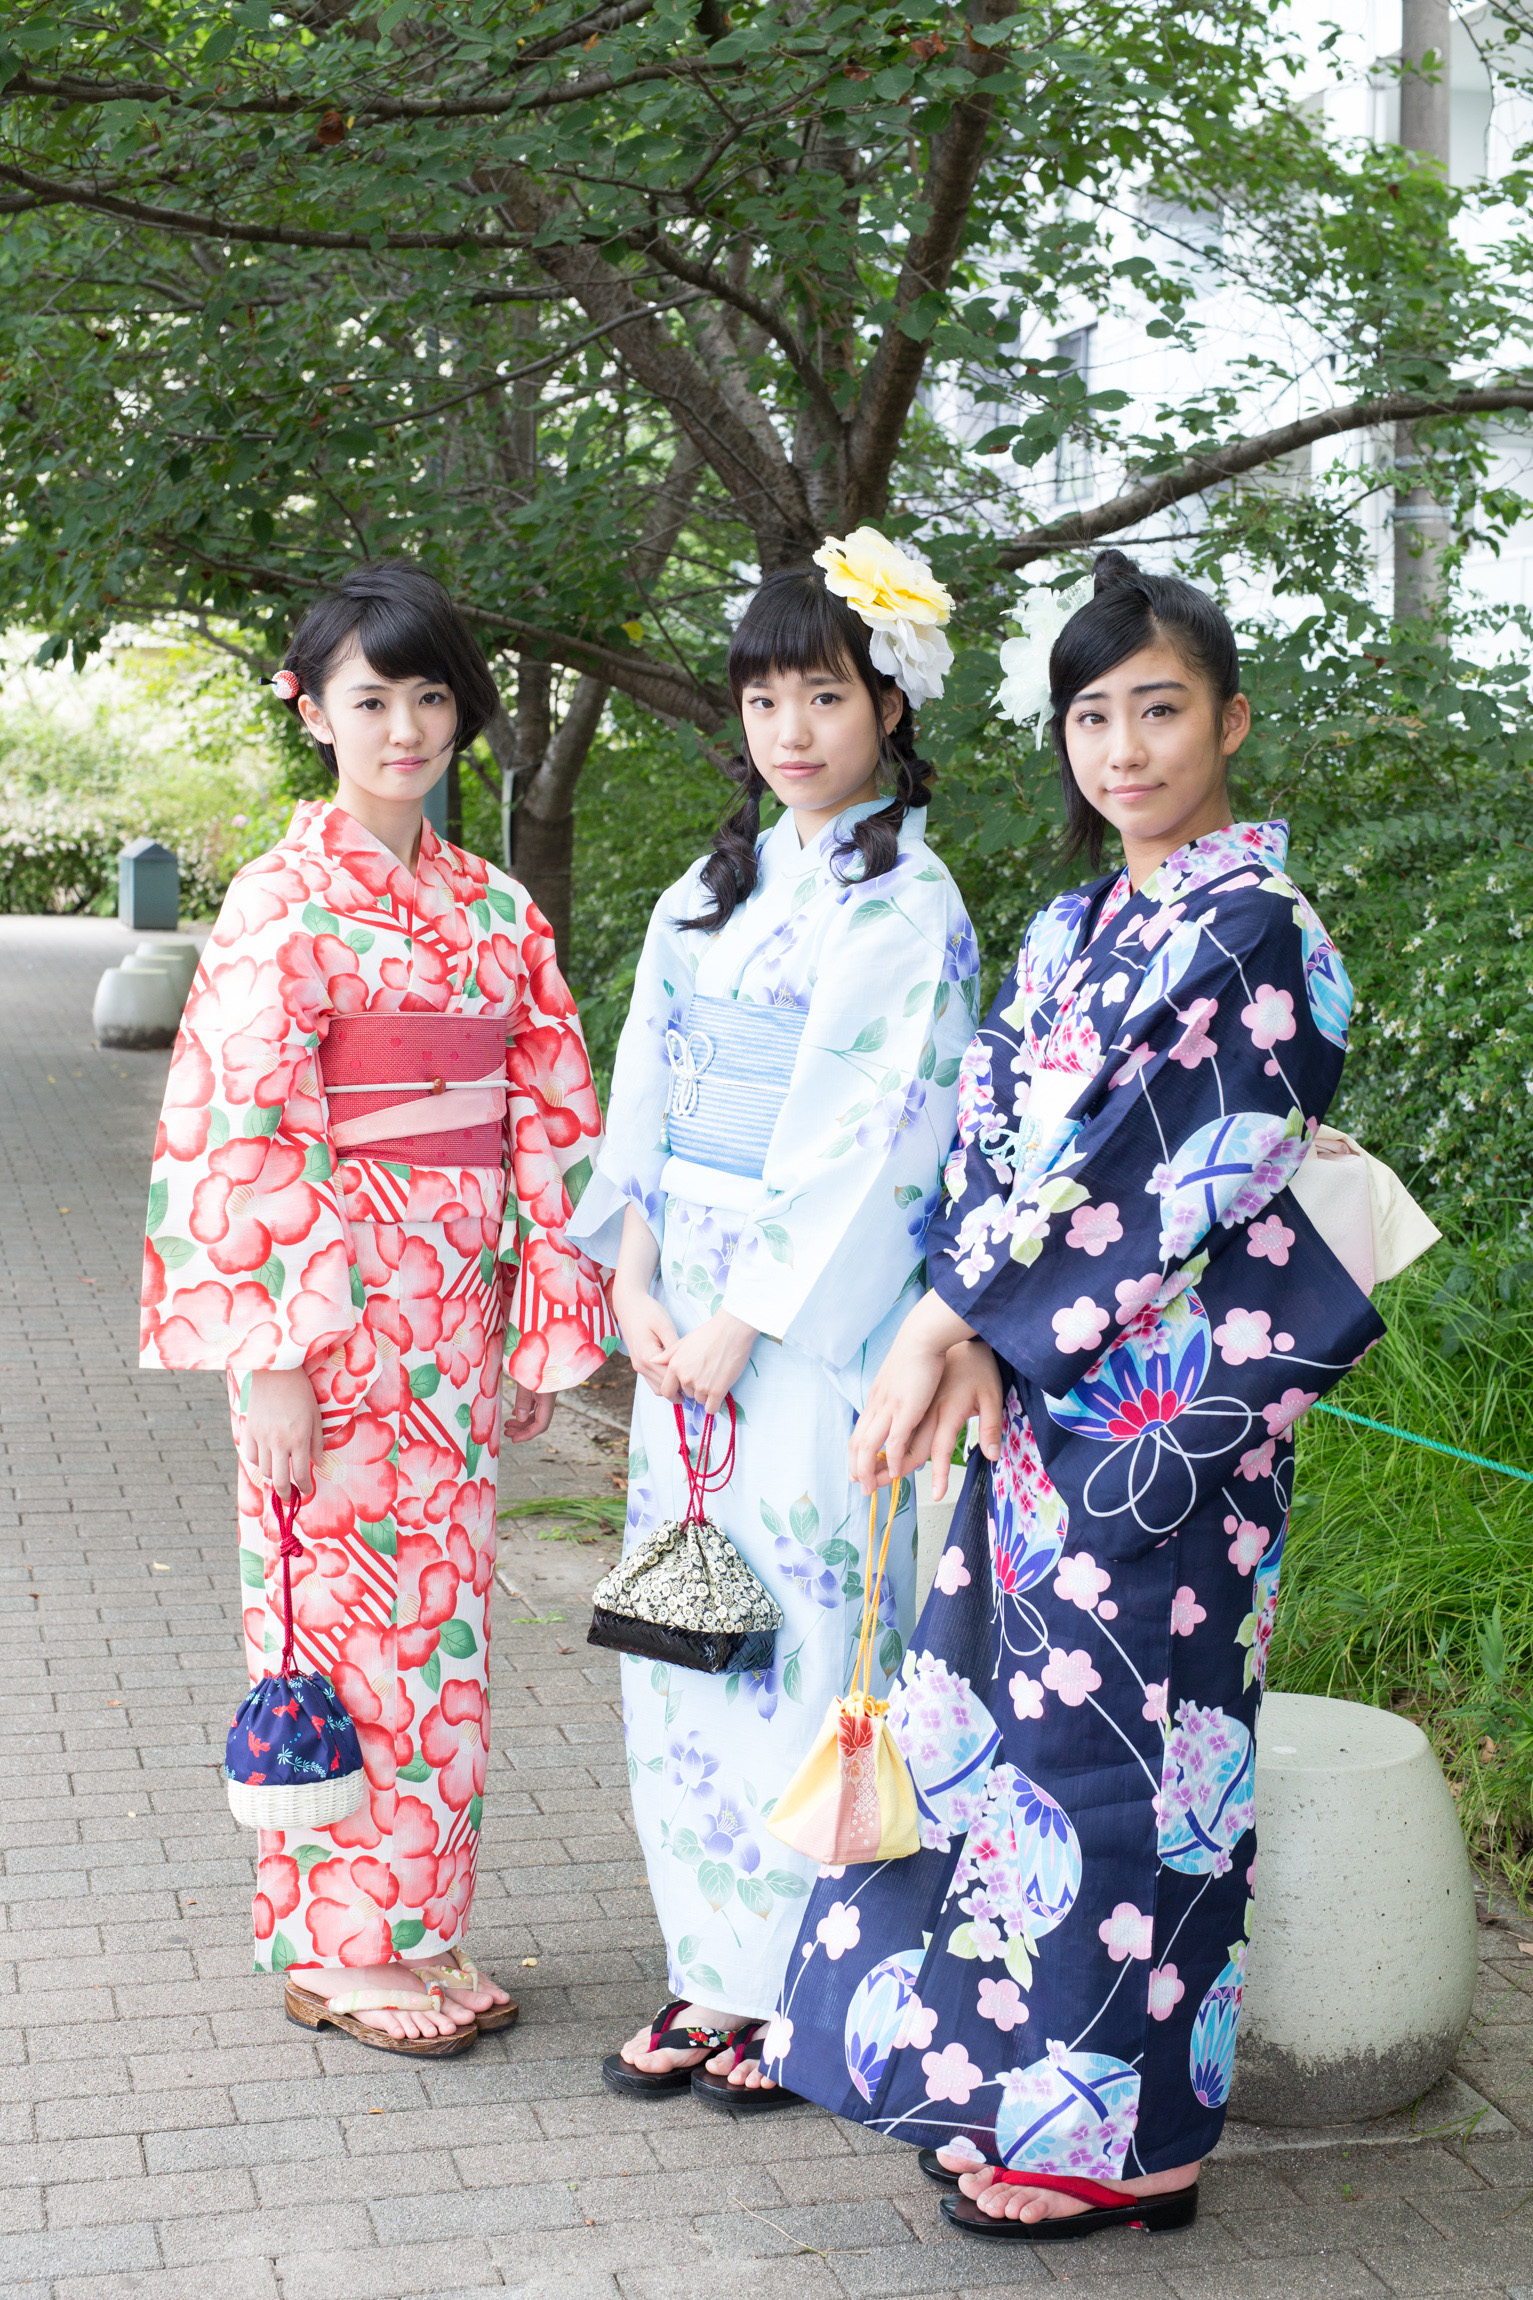 20160831_teamsyachihoko05_offshot_toukou